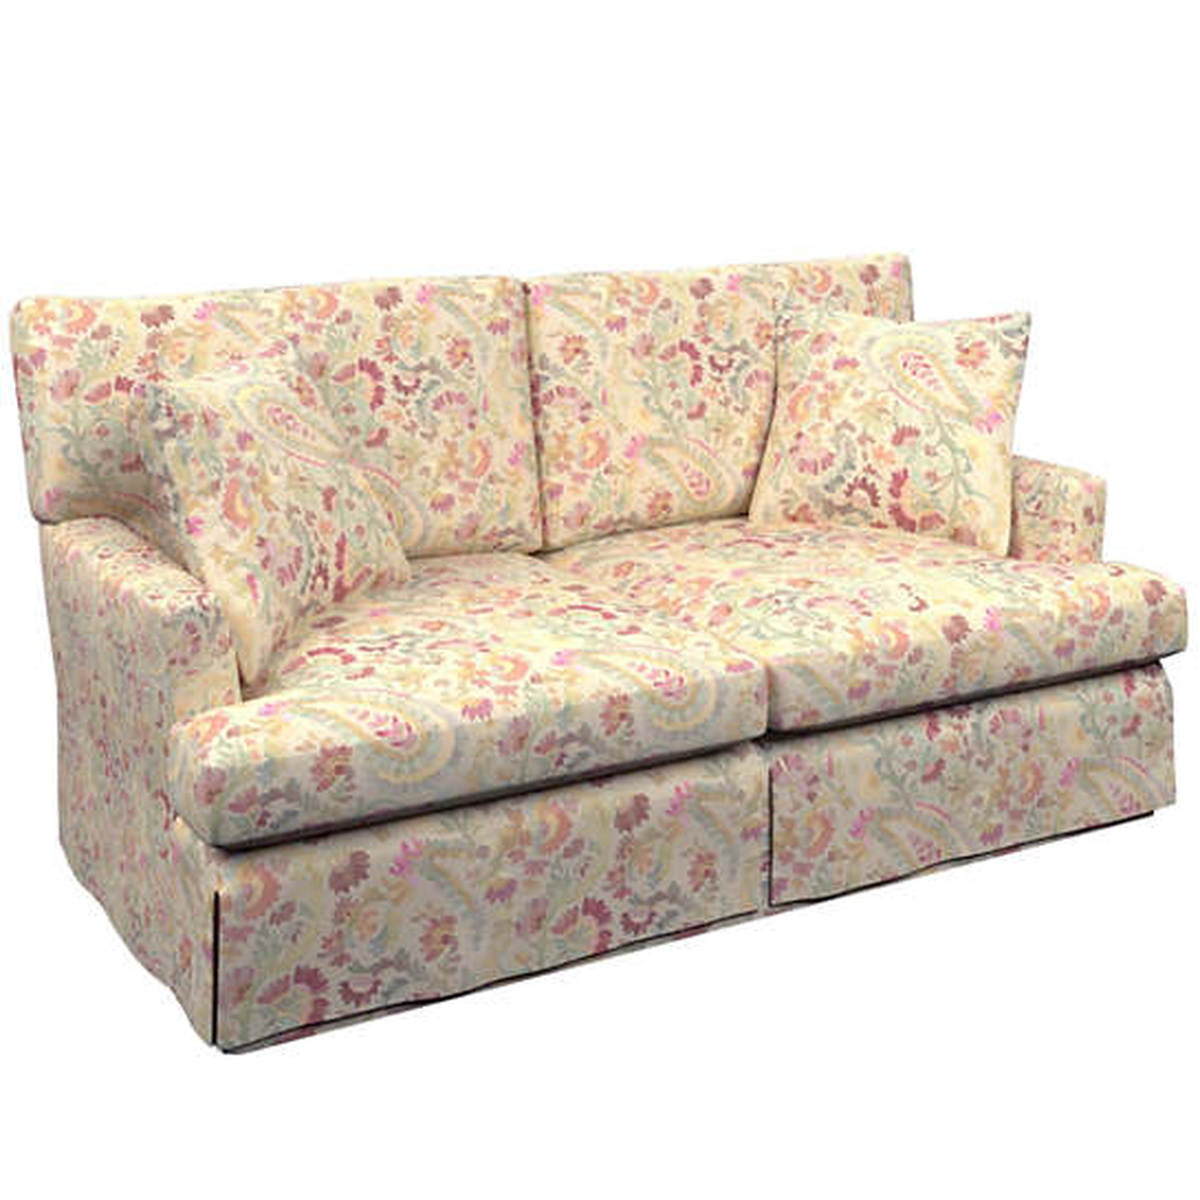 Ines Linen Saybrook 2 Seater Slipcovered Sofa